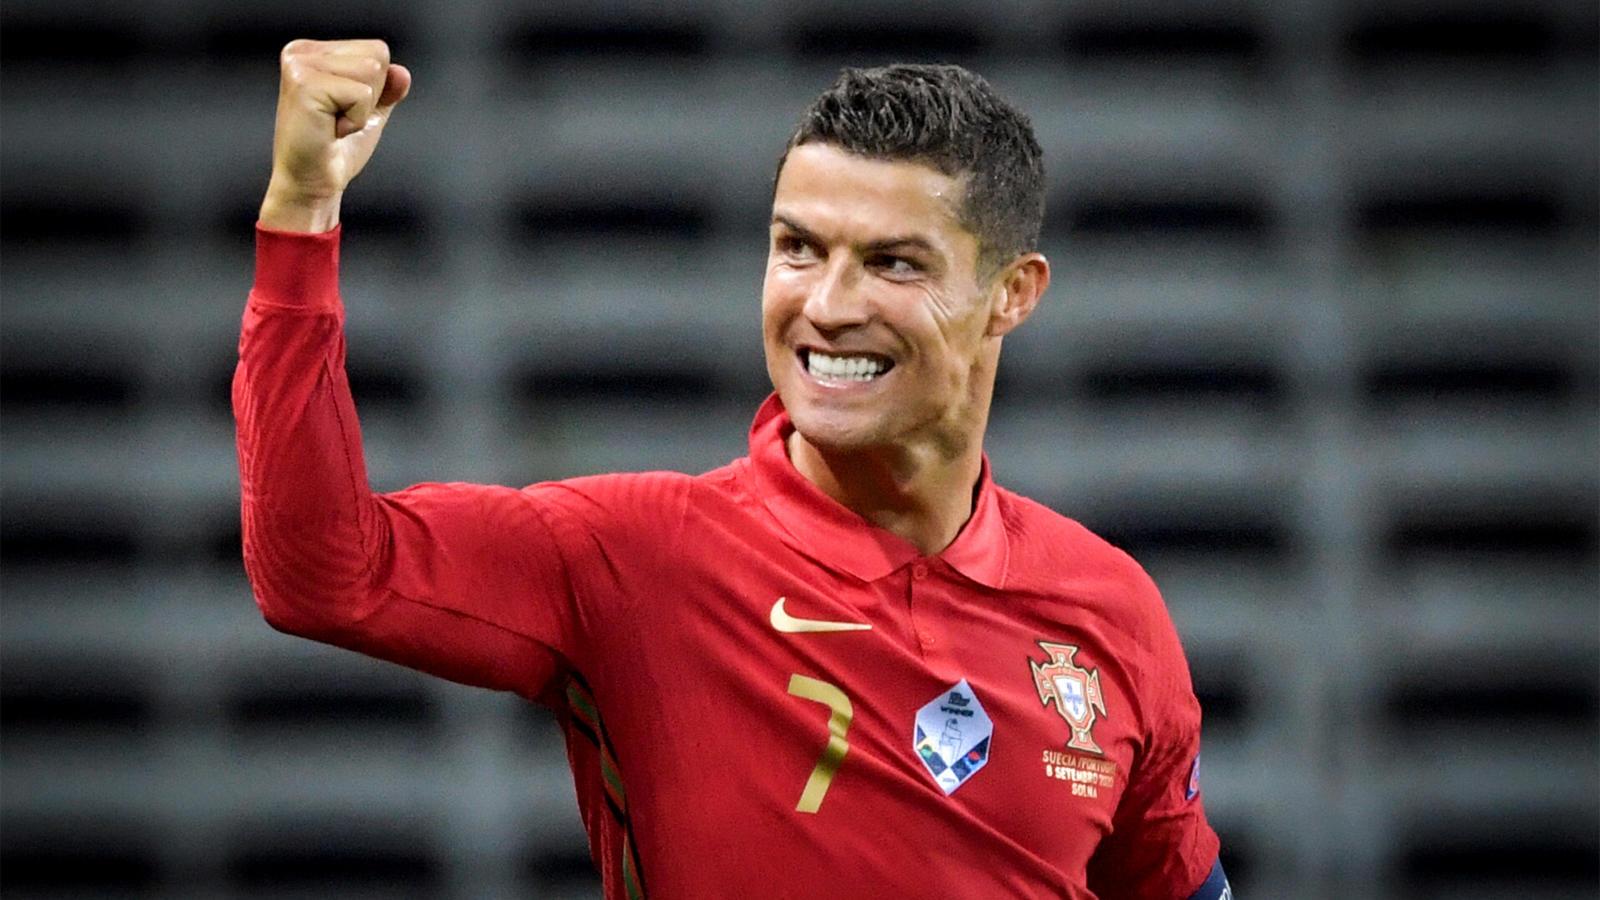 nations-league-cristiano-ronaldo-scored-his-100th-international-goal